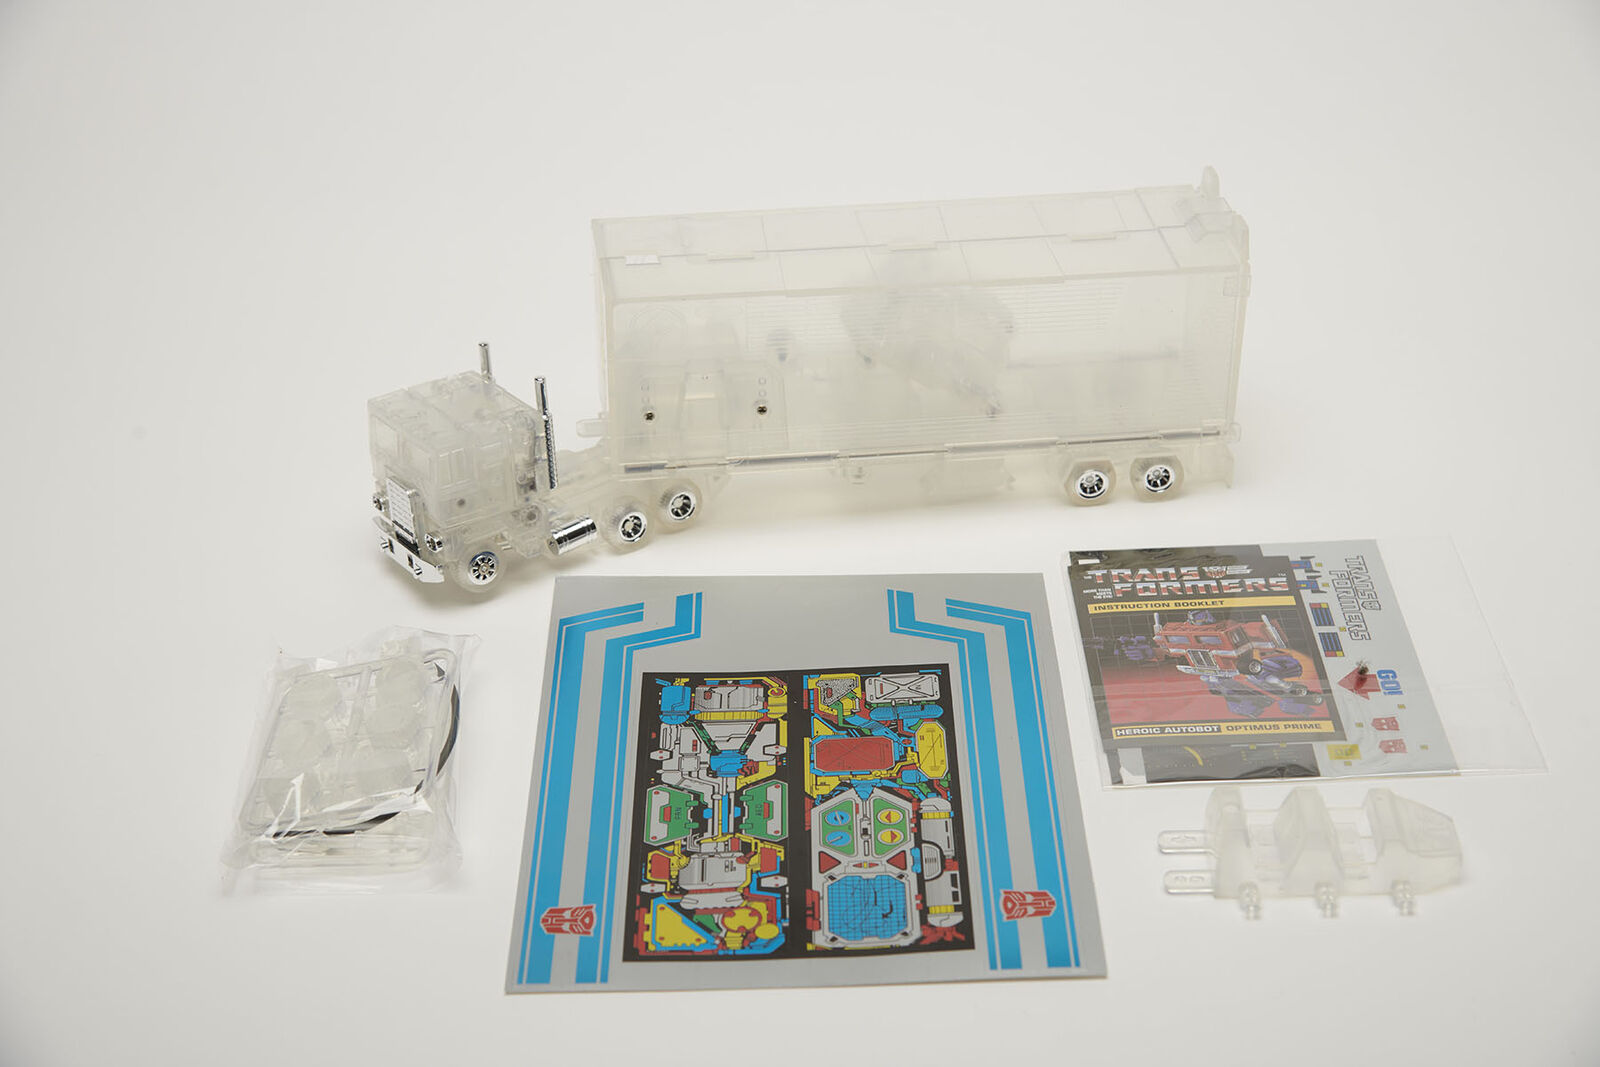 Transformers Optimes Prime G1 transformers Reissue Transparent Version AutoBot